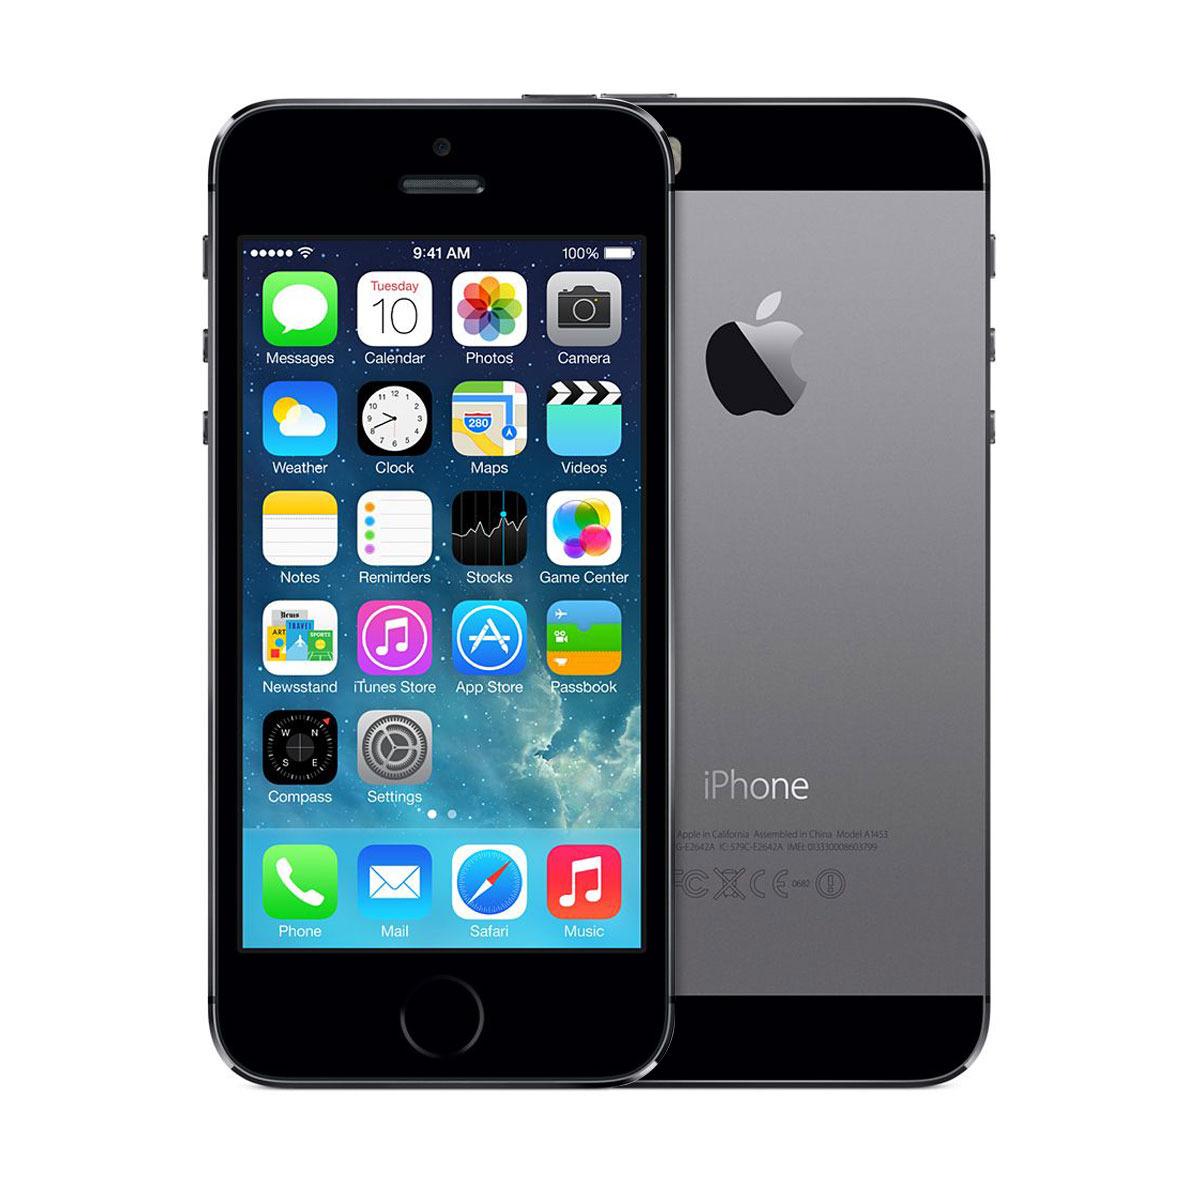 Apple iPhone 5S 16GB Space Grey použitý